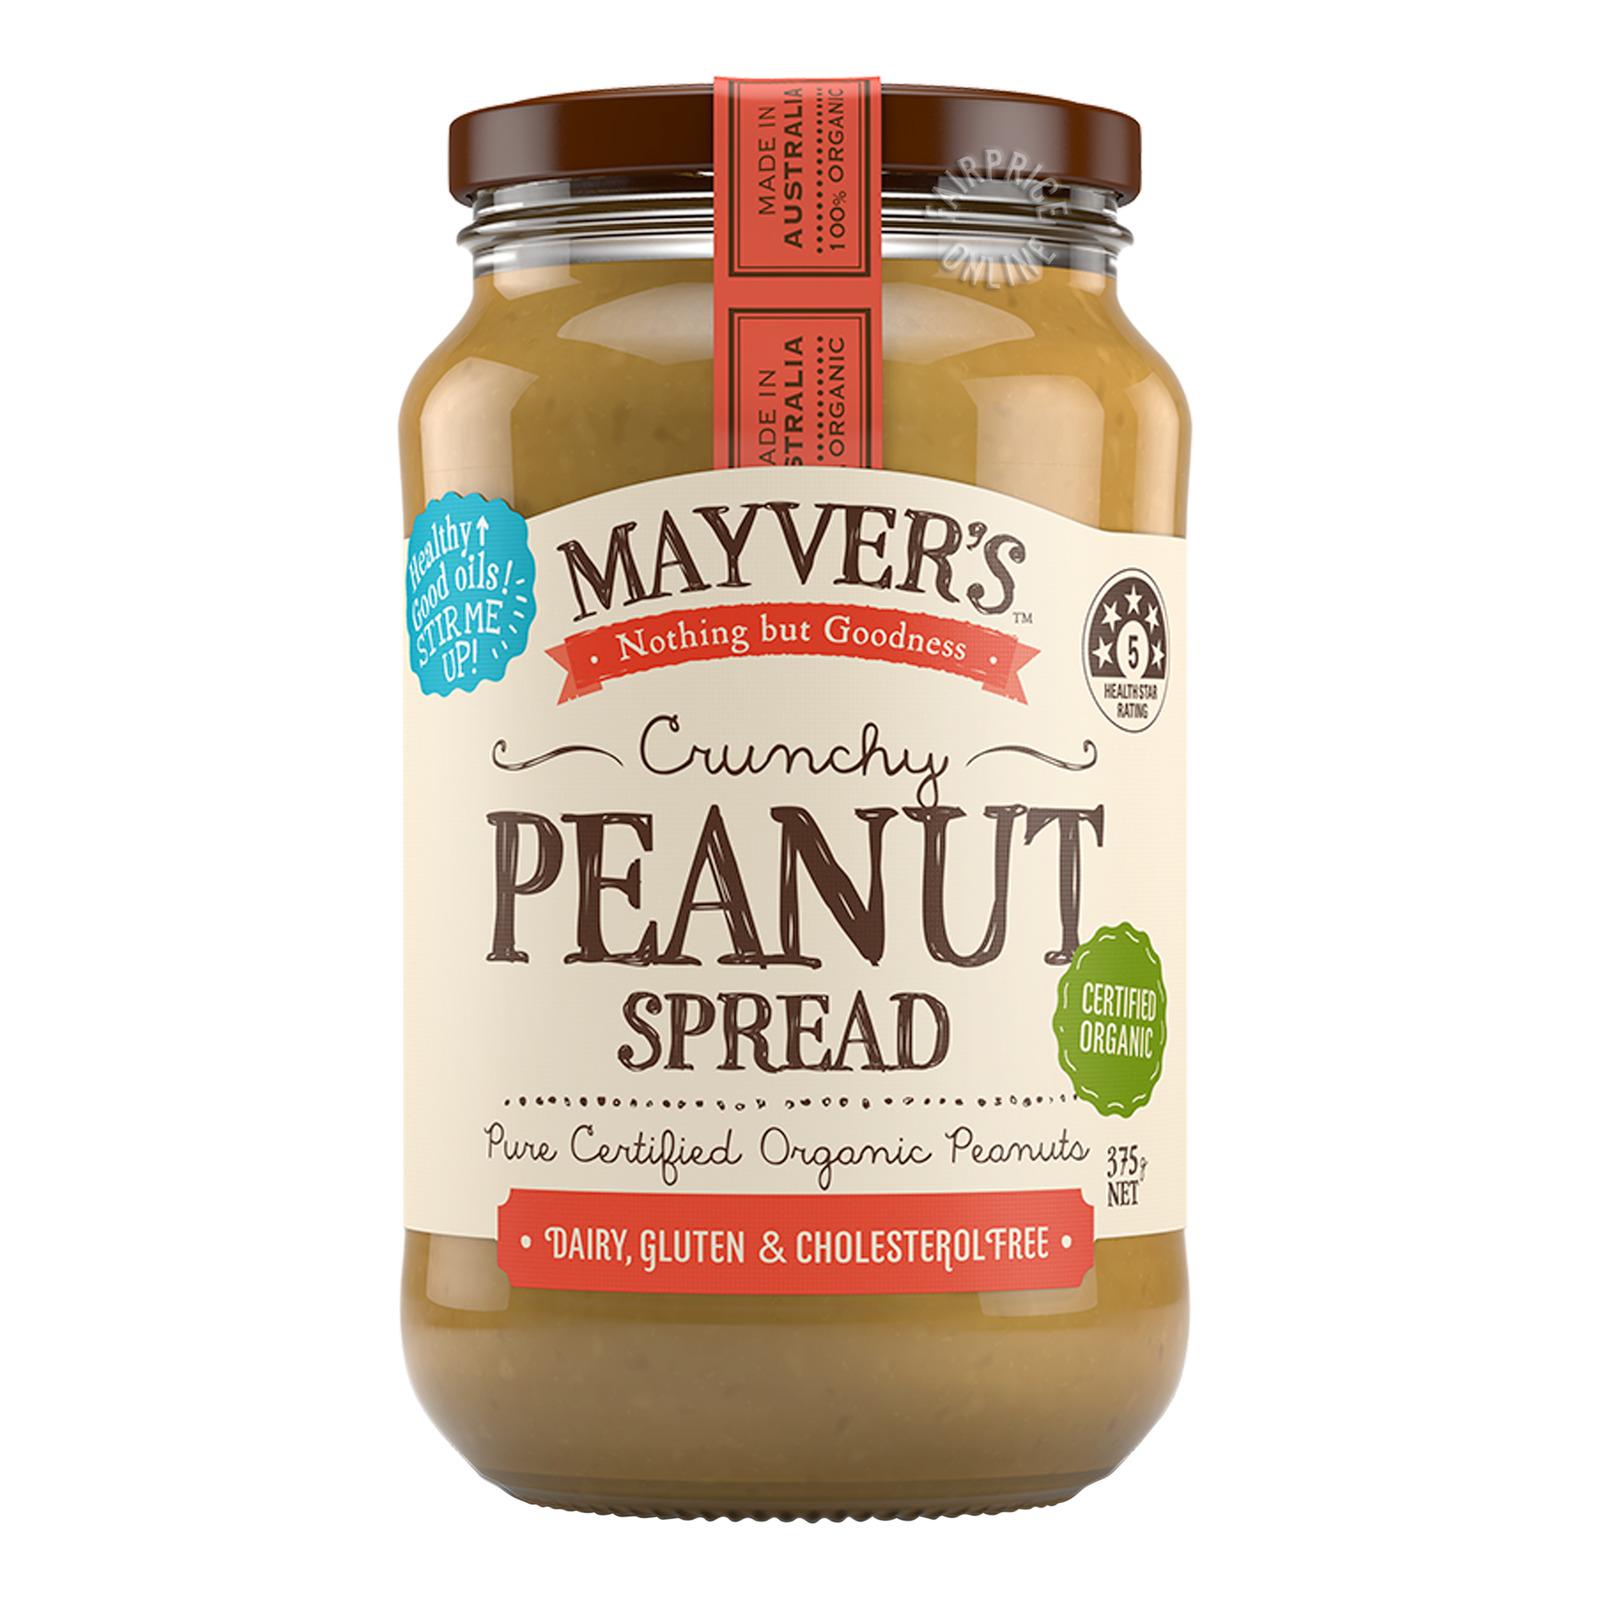 Mayver's Organic Peanut Spread - Crunchy